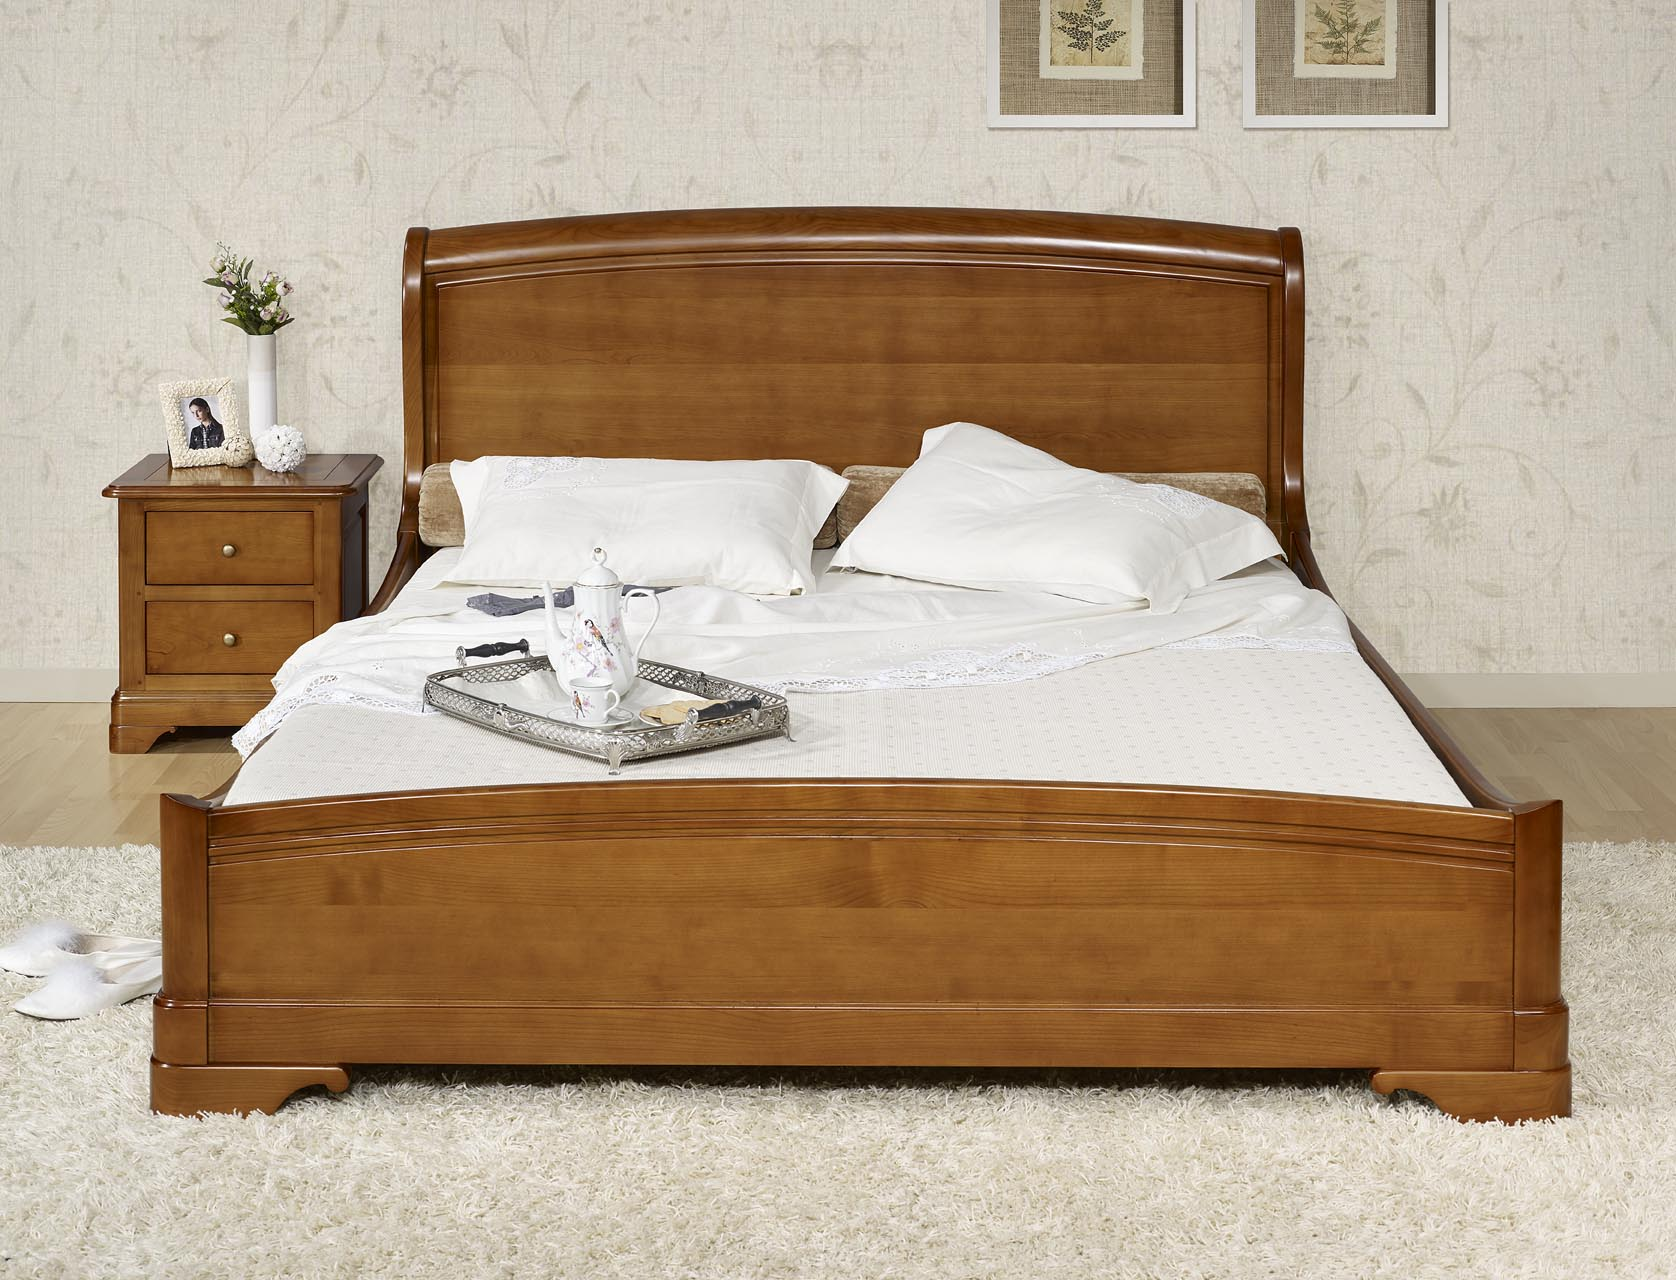 lit 160x200 en merisier massif de style louis philippe meuble en merisier. Black Bedroom Furniture Sets. Home Design Ideas